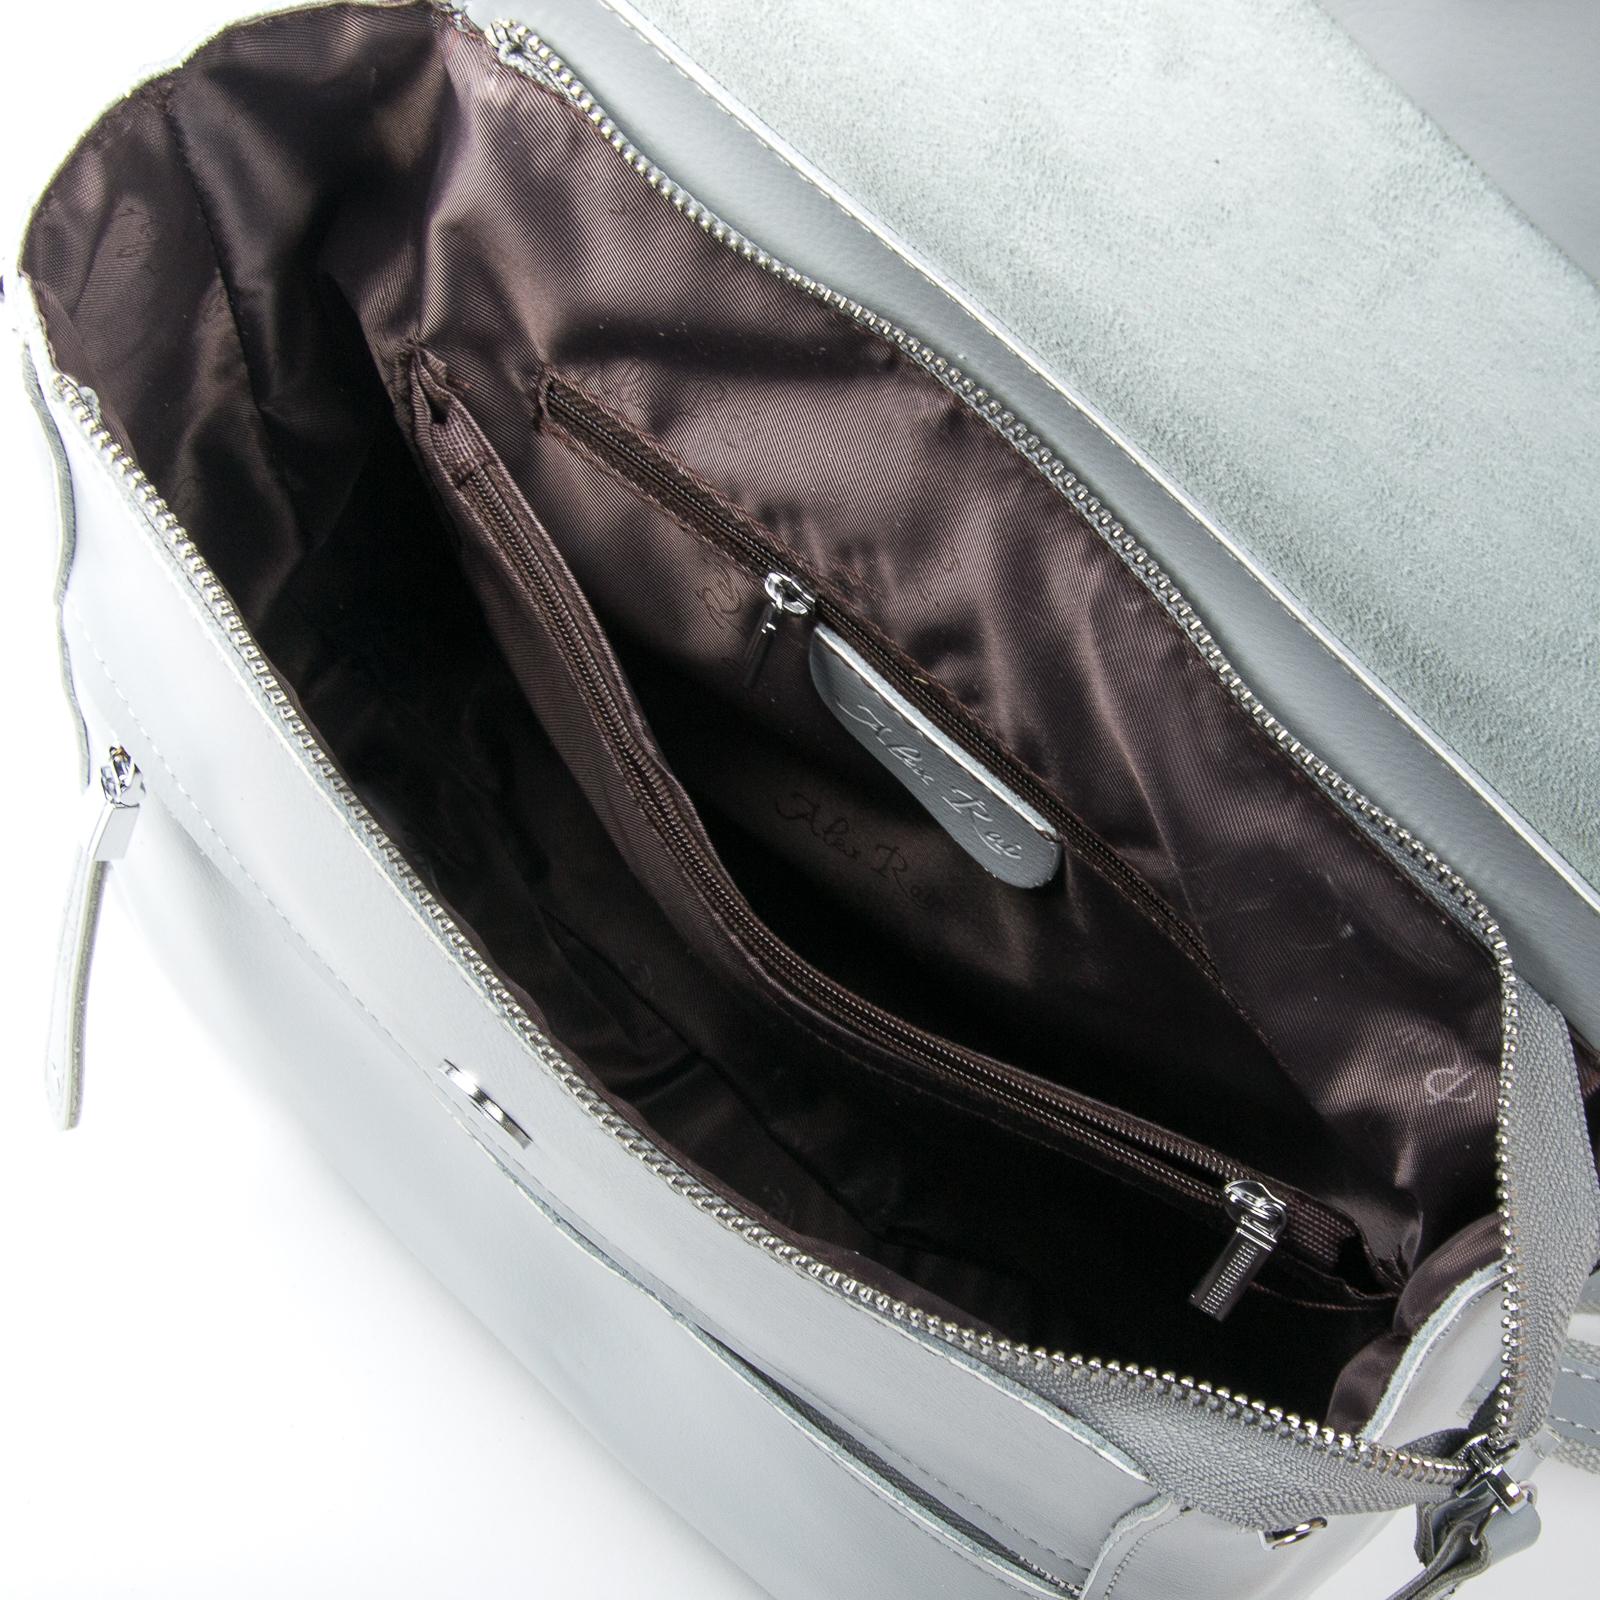 Сумка Женская Рюкзак кожа ALEX RAI 1005 l-grey - фото 5